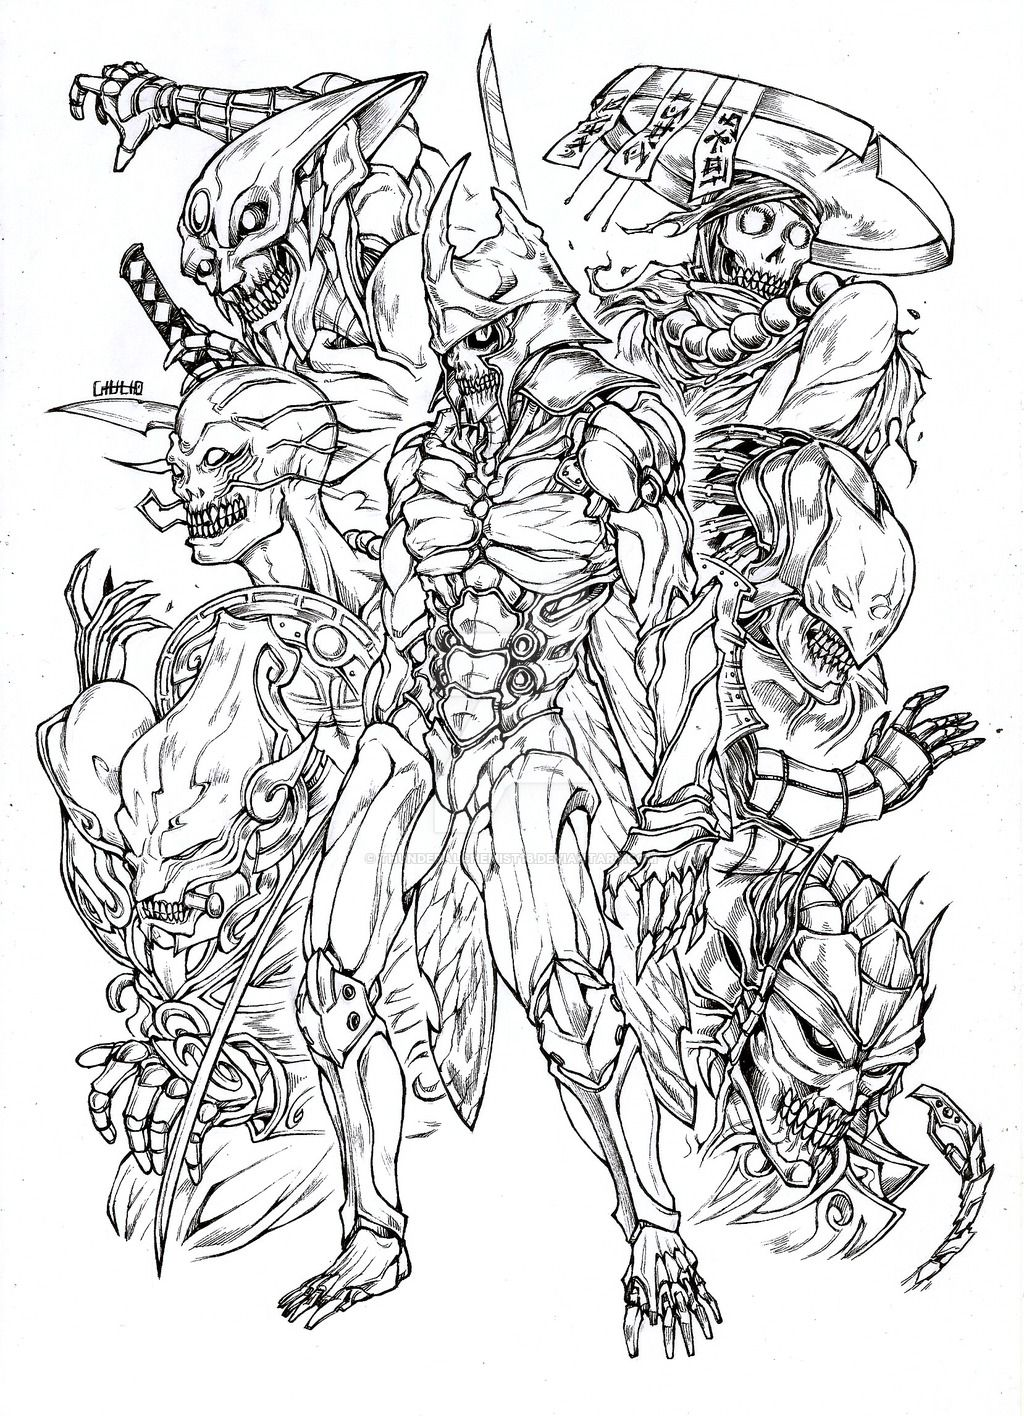 Yoshimitsu Tekken Samurai Art Character Design Inspiration Graphic Illustration